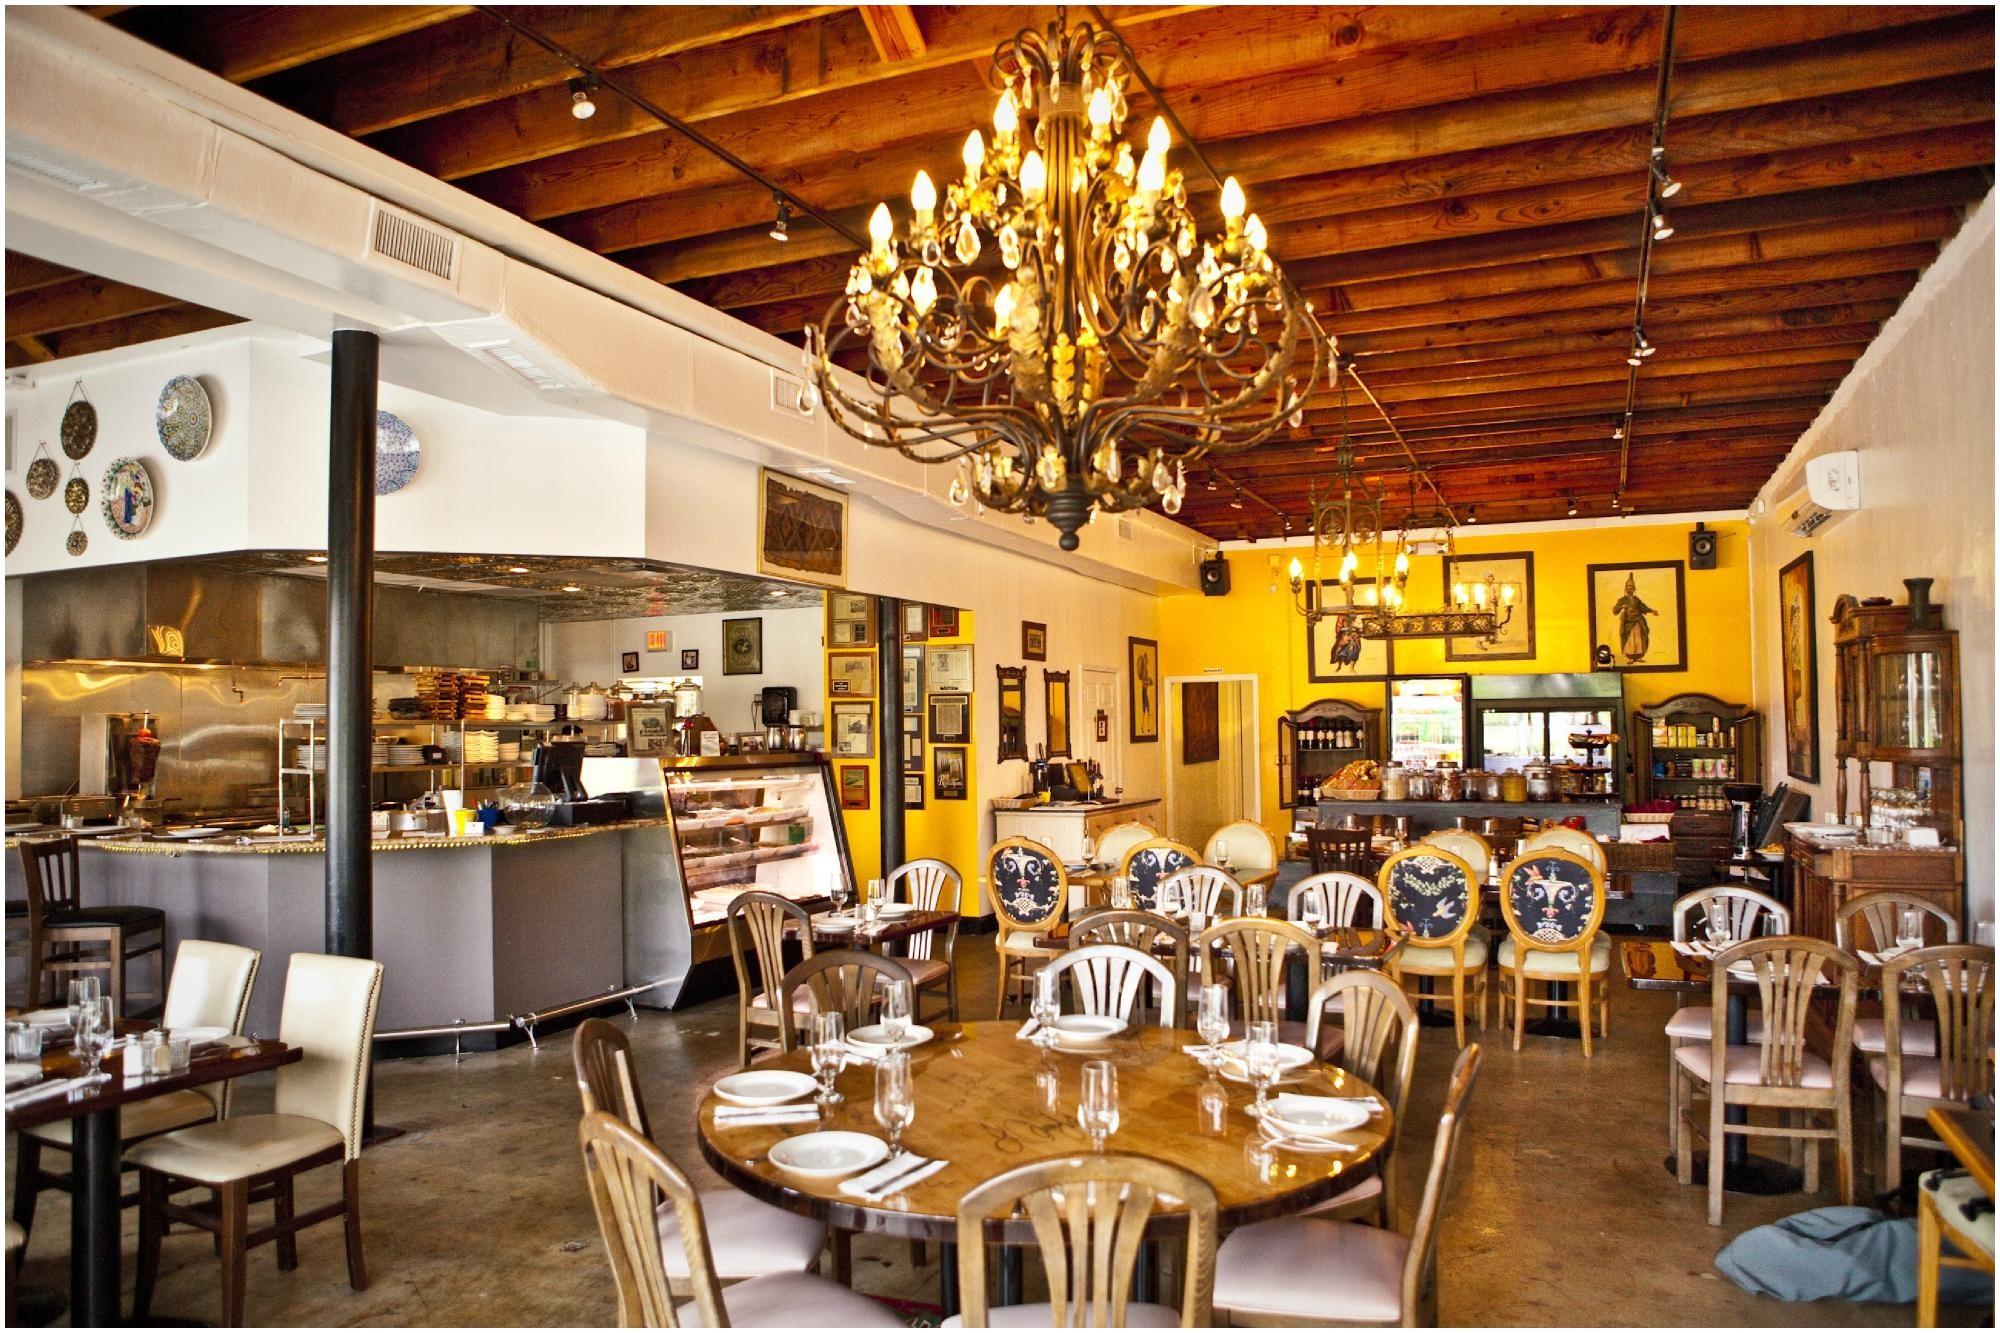 Best Italian Restaurants In Palm Beach Gardens Best Of the 10 Best Restaurants Near northwood Village Tripadvisor